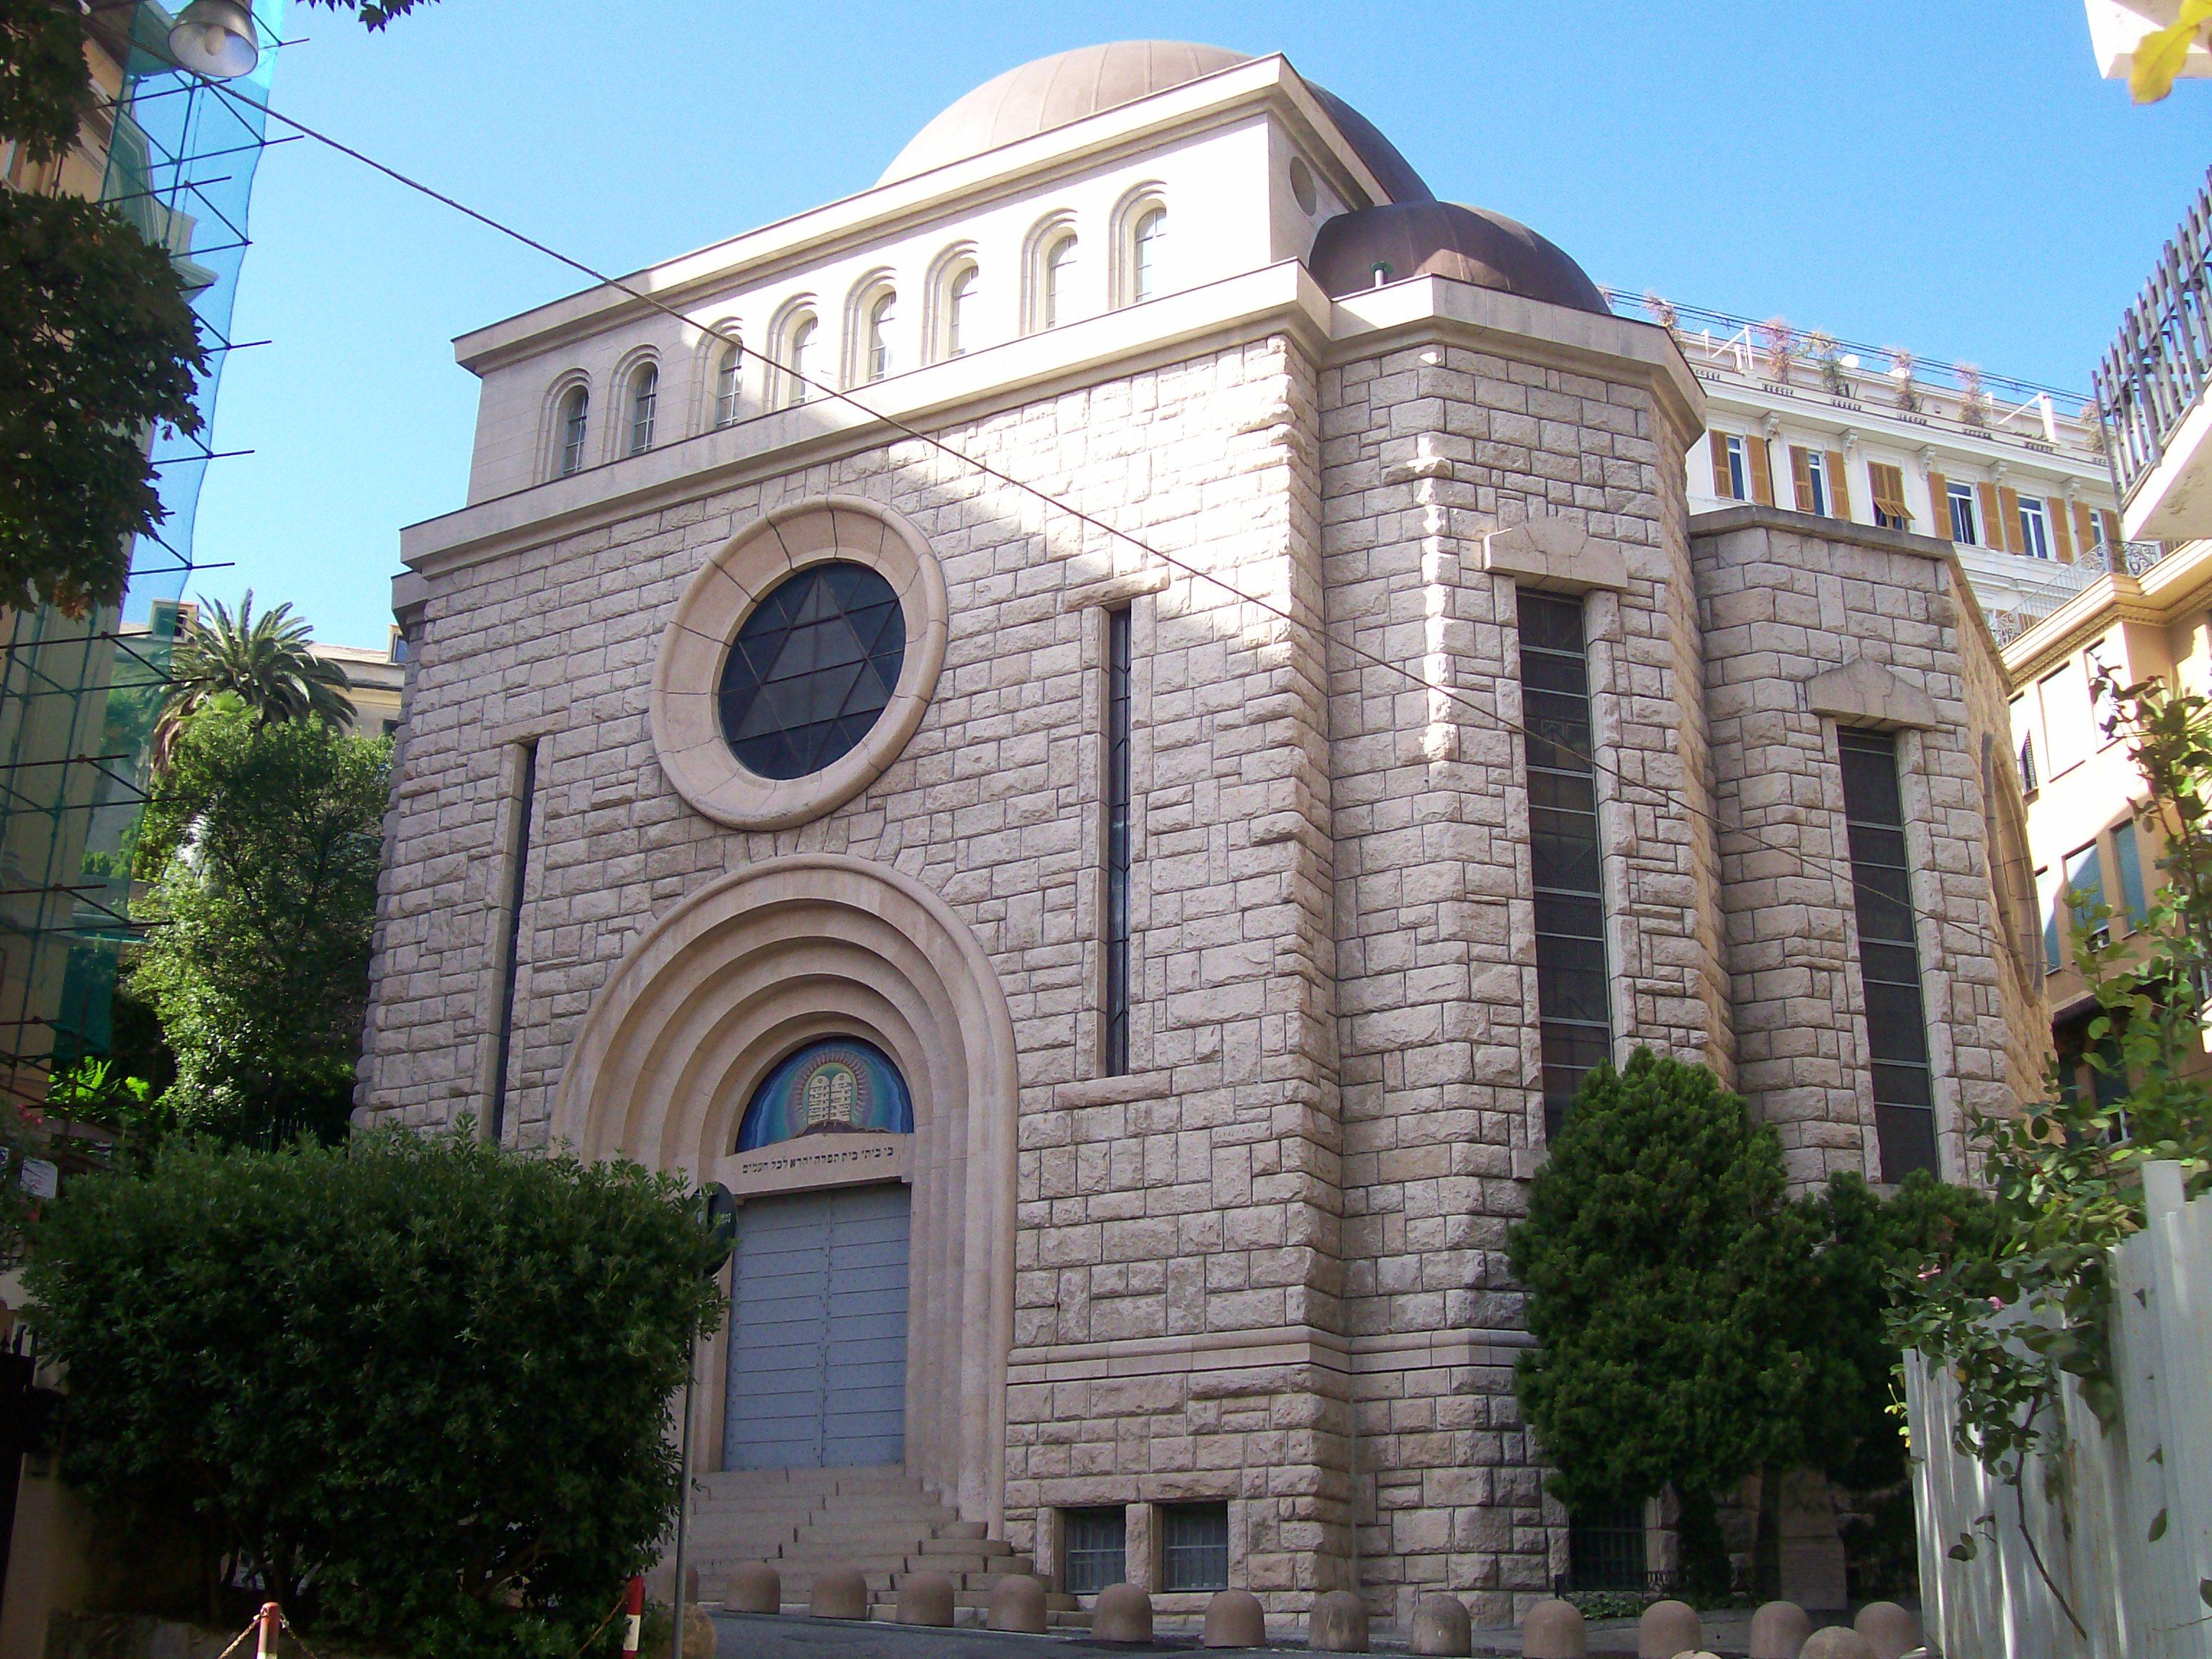 Sinagoga_di_genova.jpg